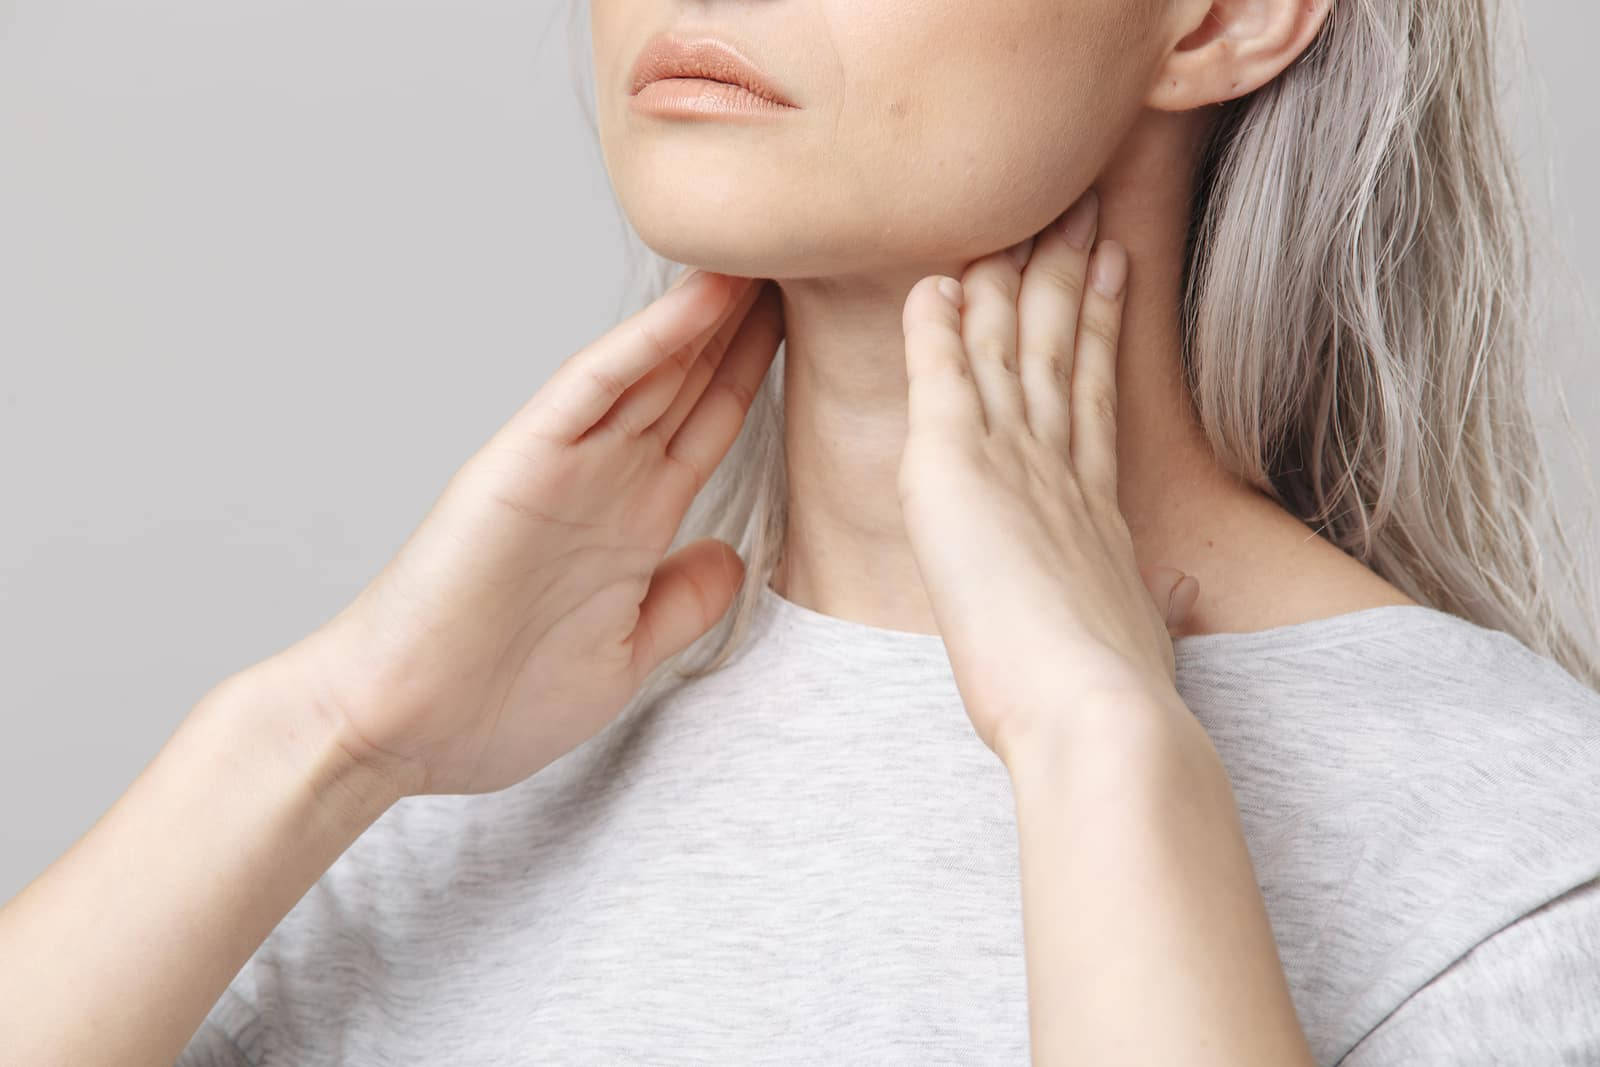 hypothyroidism and milk thistle